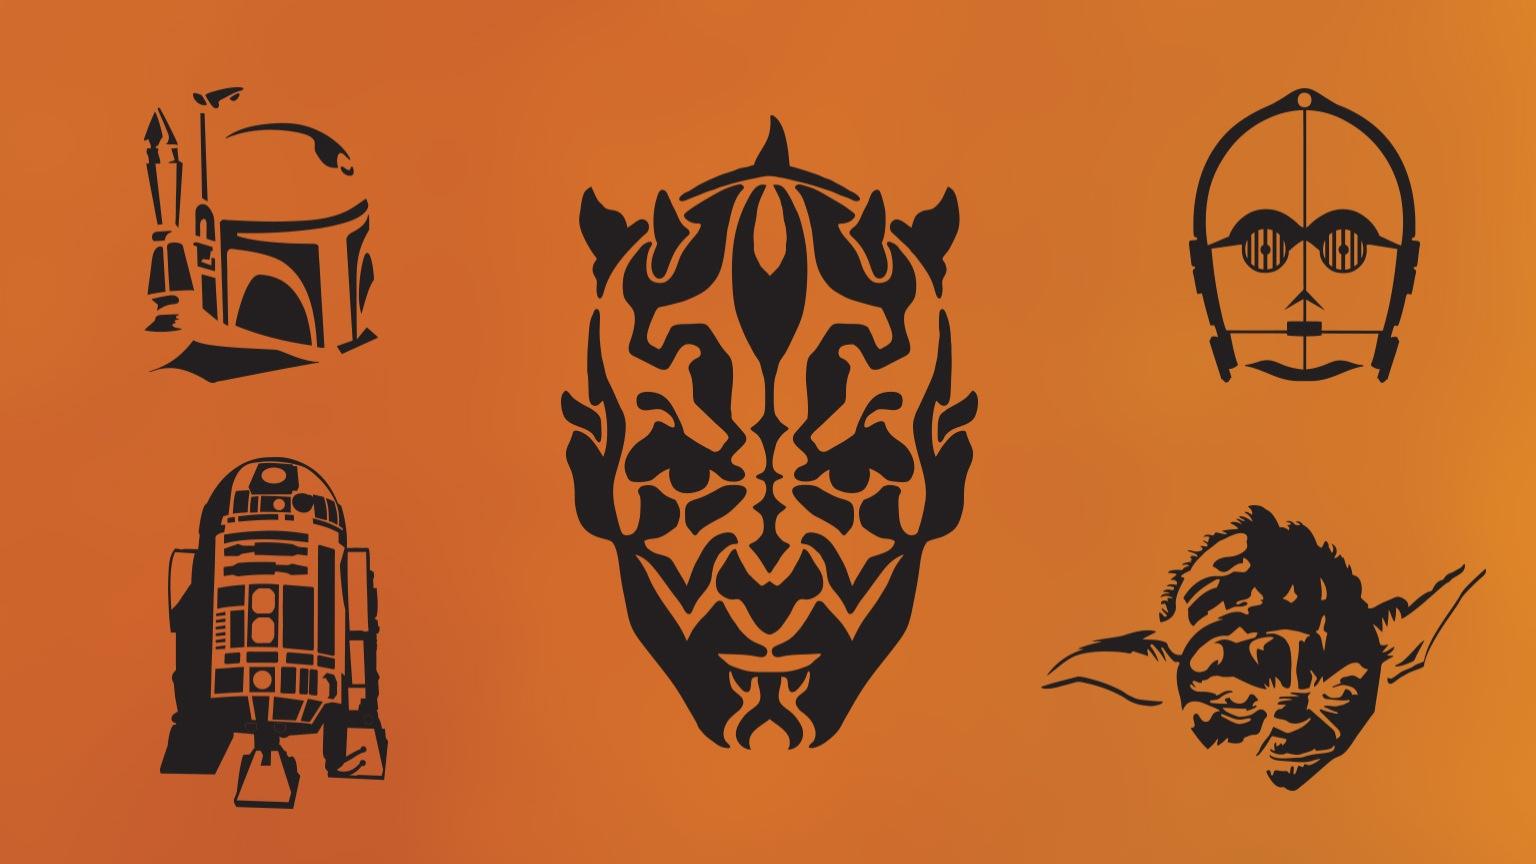 Diy Star Wars Pumpkin Stencils | Starwars - Star Wars Pumpkin Stencils Free Printable